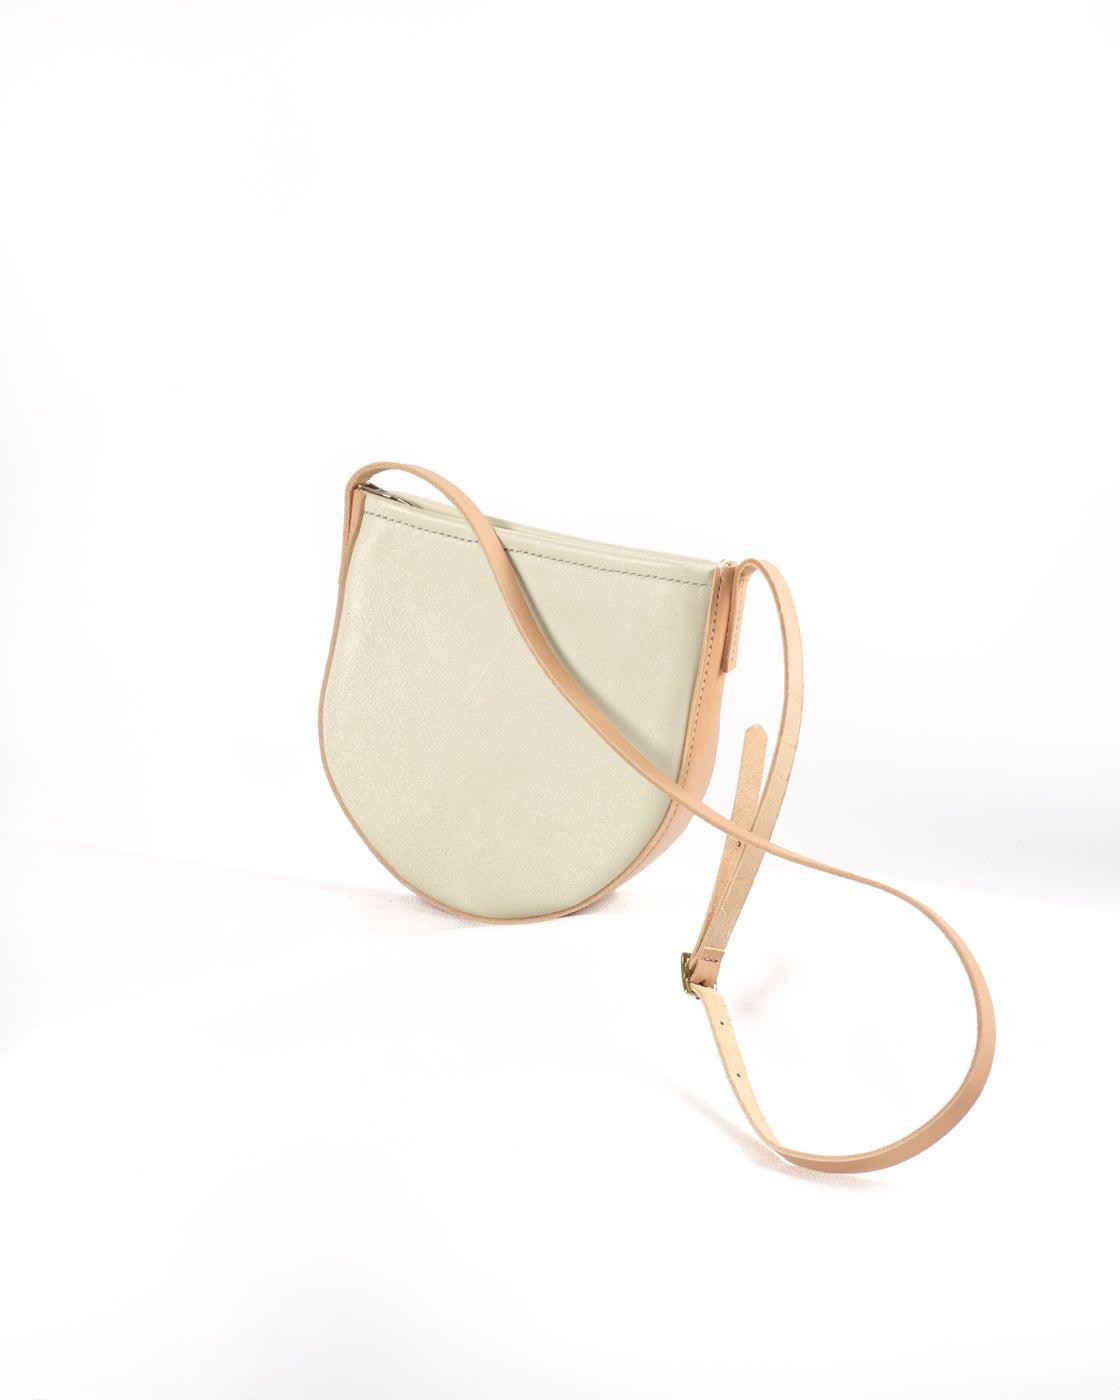 Image of Round Crossbody in Cream